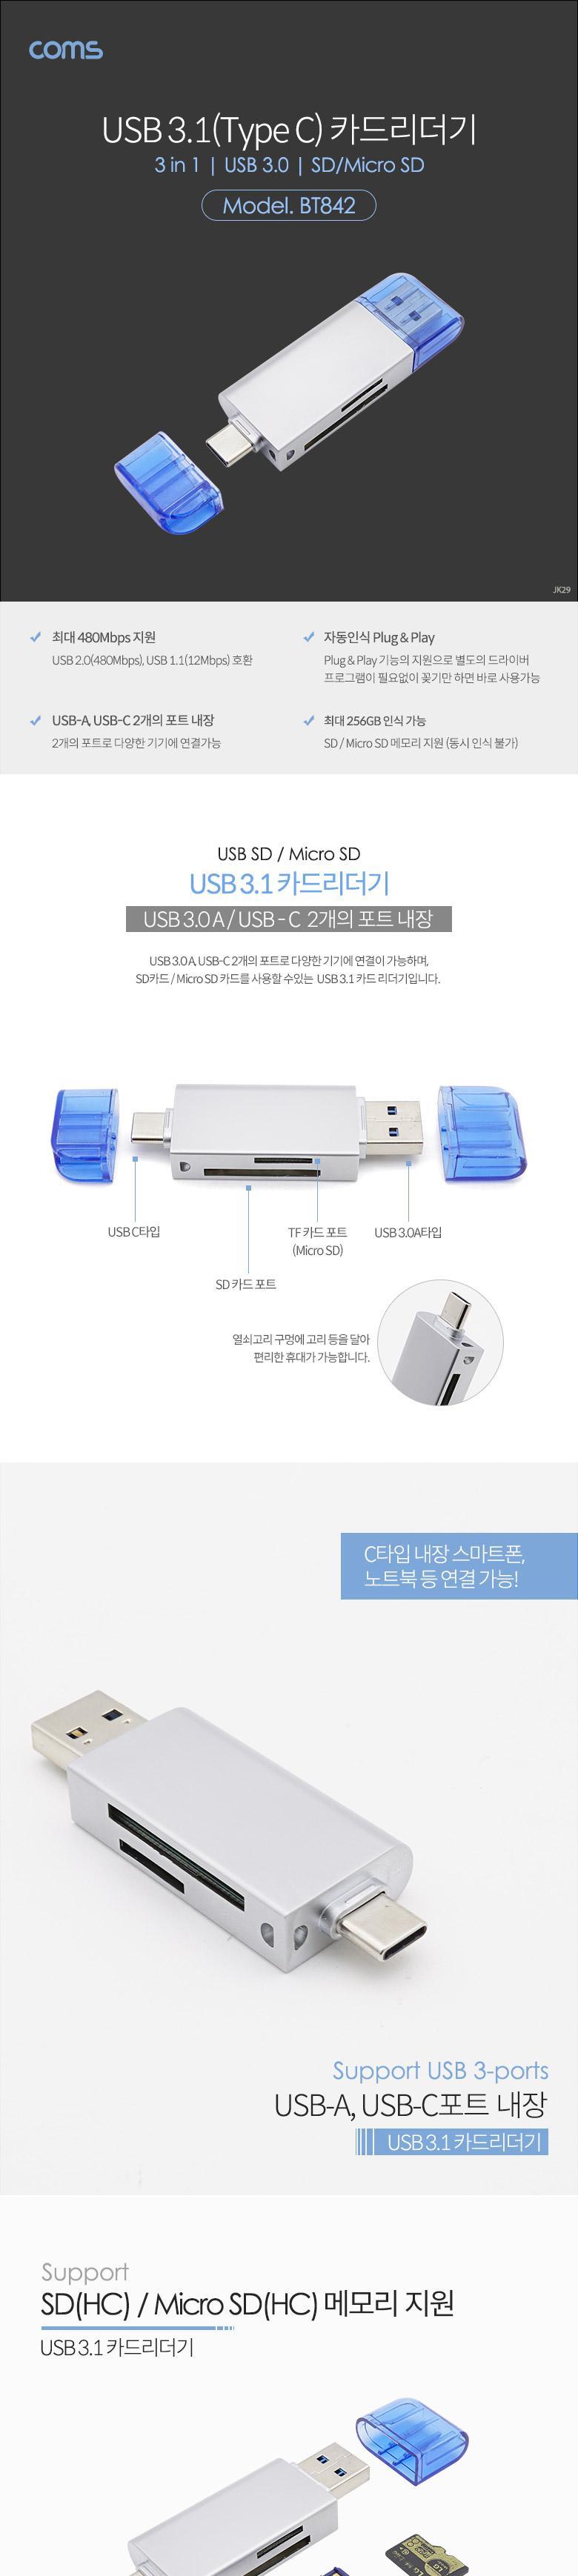 Coms USB 3.1(Type C) 카드리더기 스마트폰카드리더기 스마트폰카드리더기 듀얼카드리더기 휴대용카드리더기 SD카드리더기 저장장치액세서리